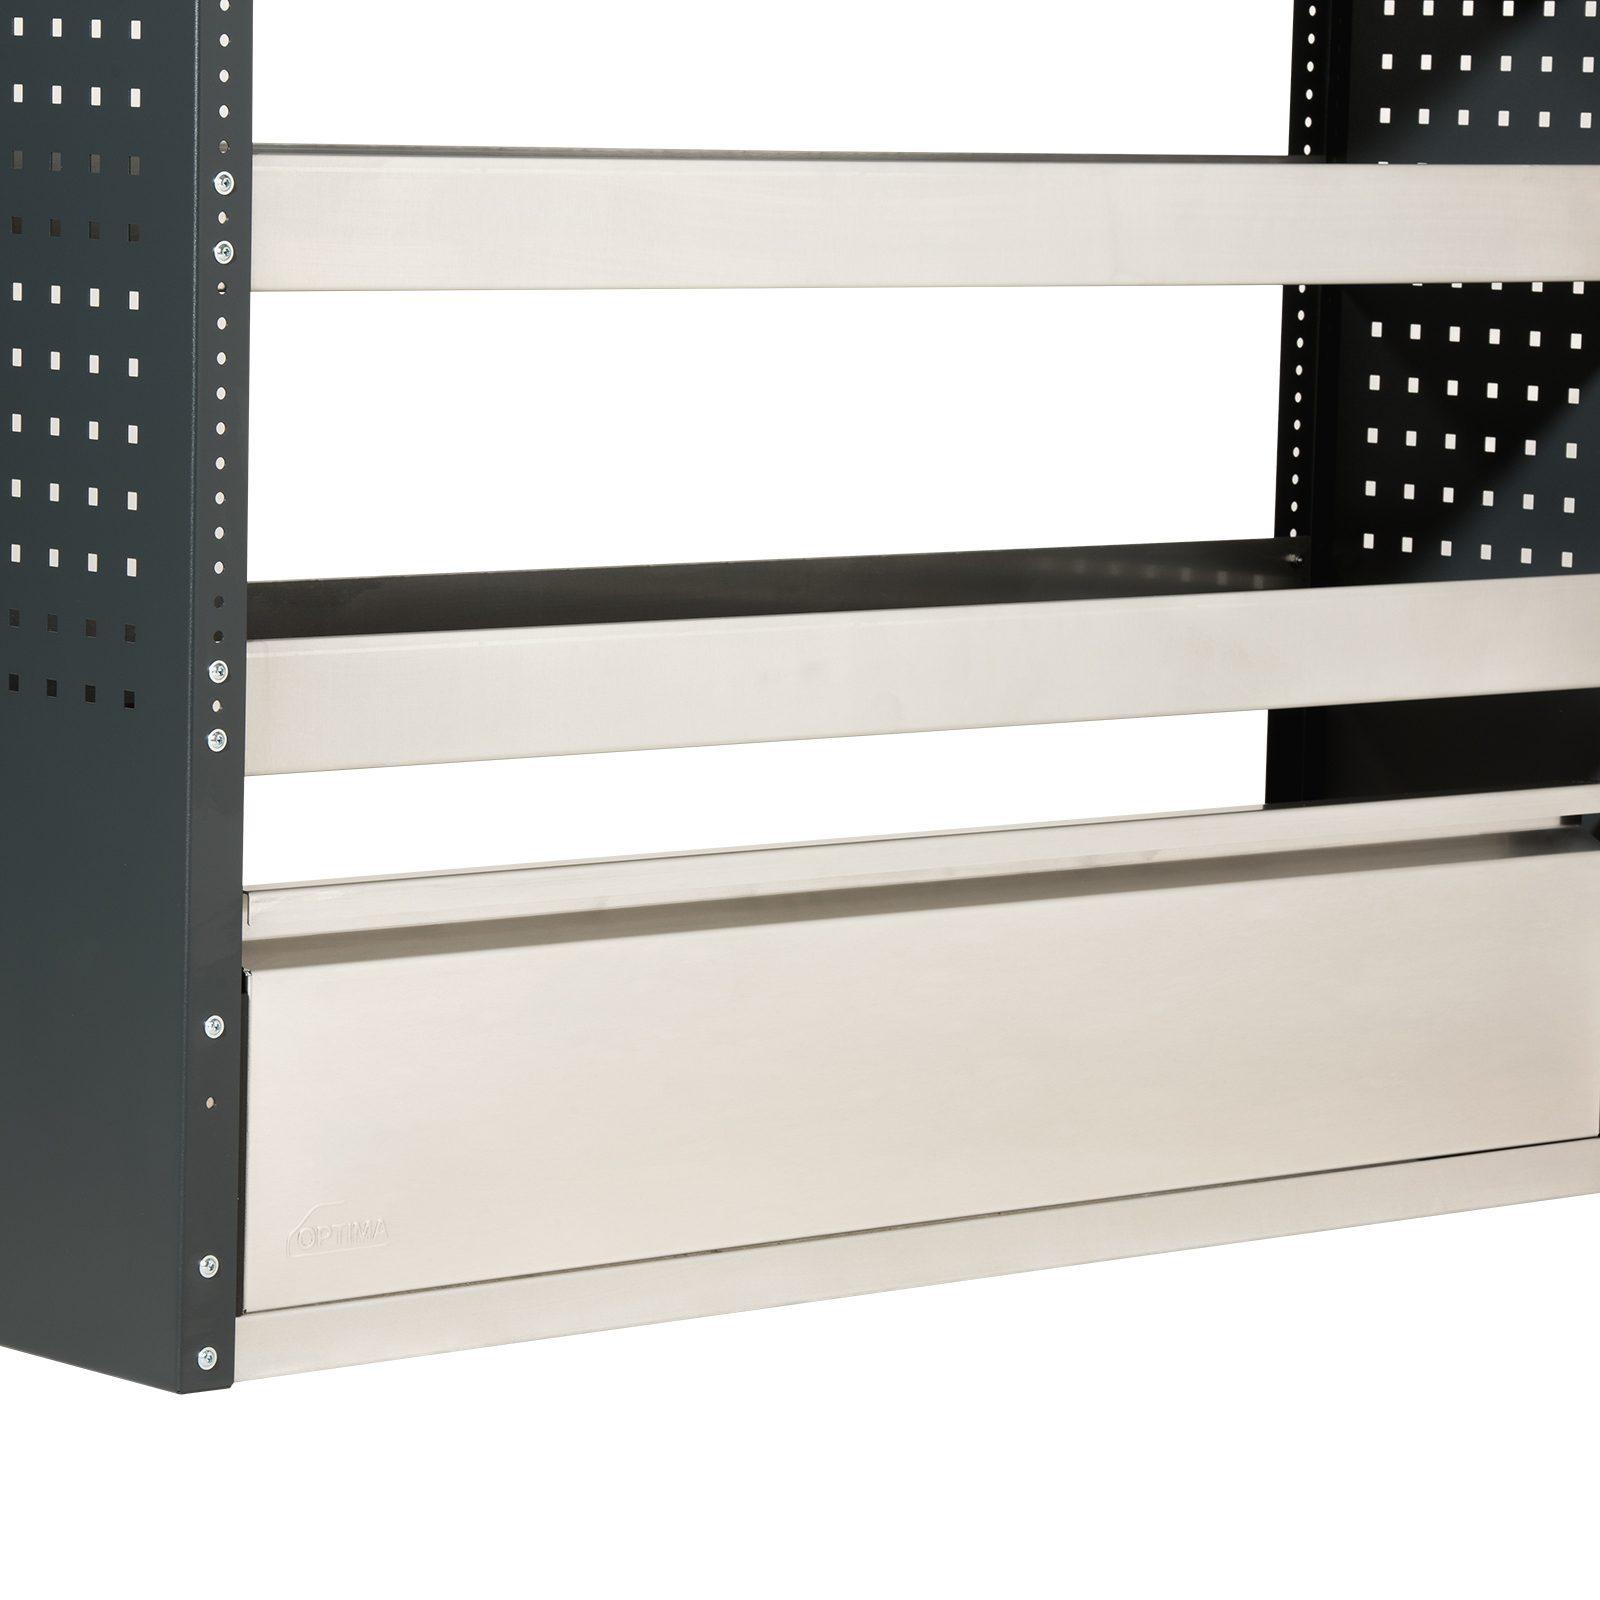 optima-fahrzeugeinrichtungen-regal-vatiante-sichererungsklappe-geschlossen-stahl-aluminium-silber-professional-breite-1250mm-einfach-v1